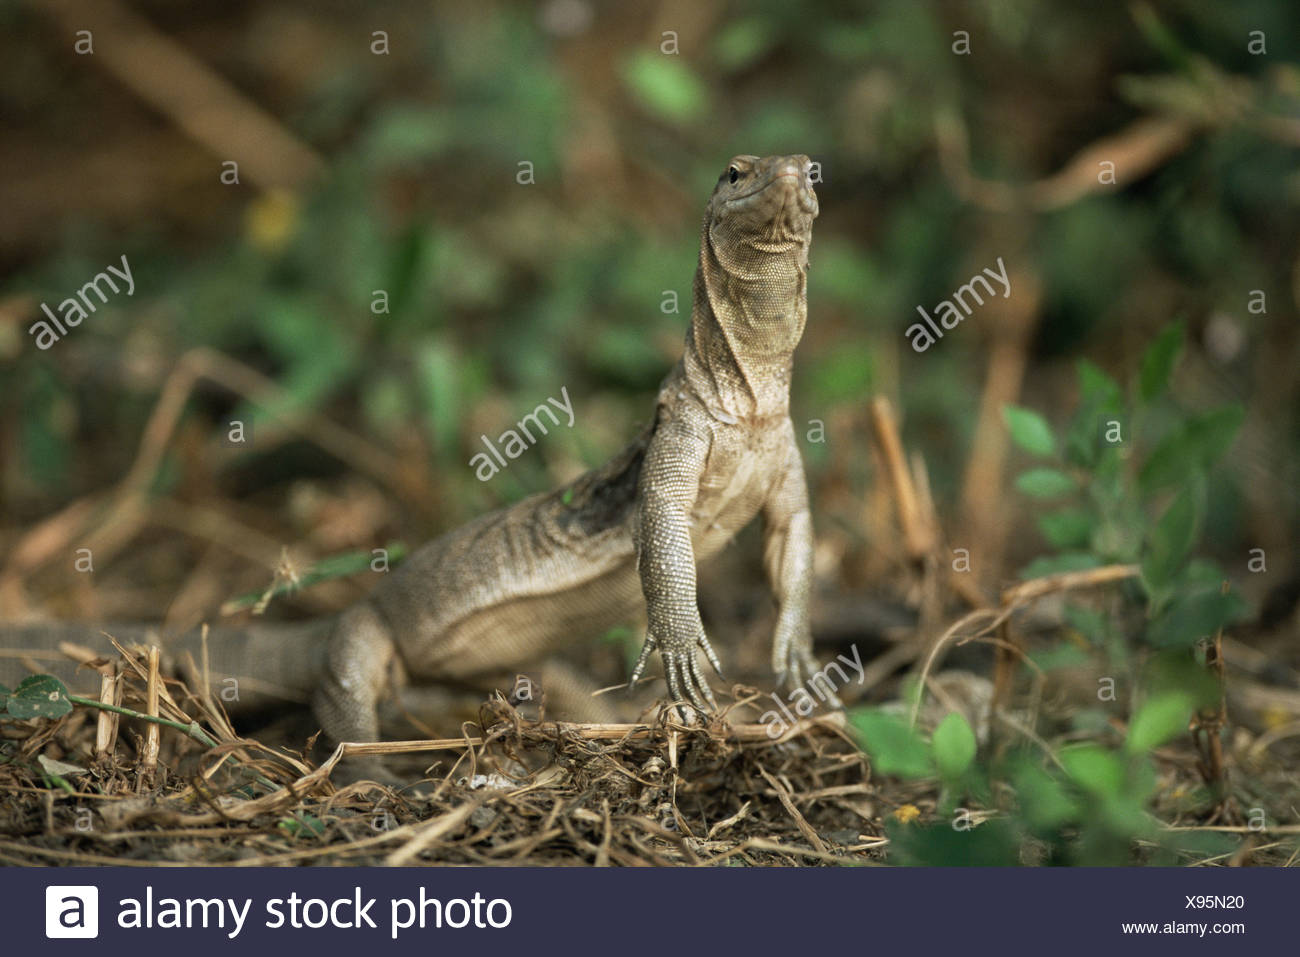 Bengal monitor lizard Varanus benghalensis Keoladeo Ghana NP Bharatpur India - Stock Image